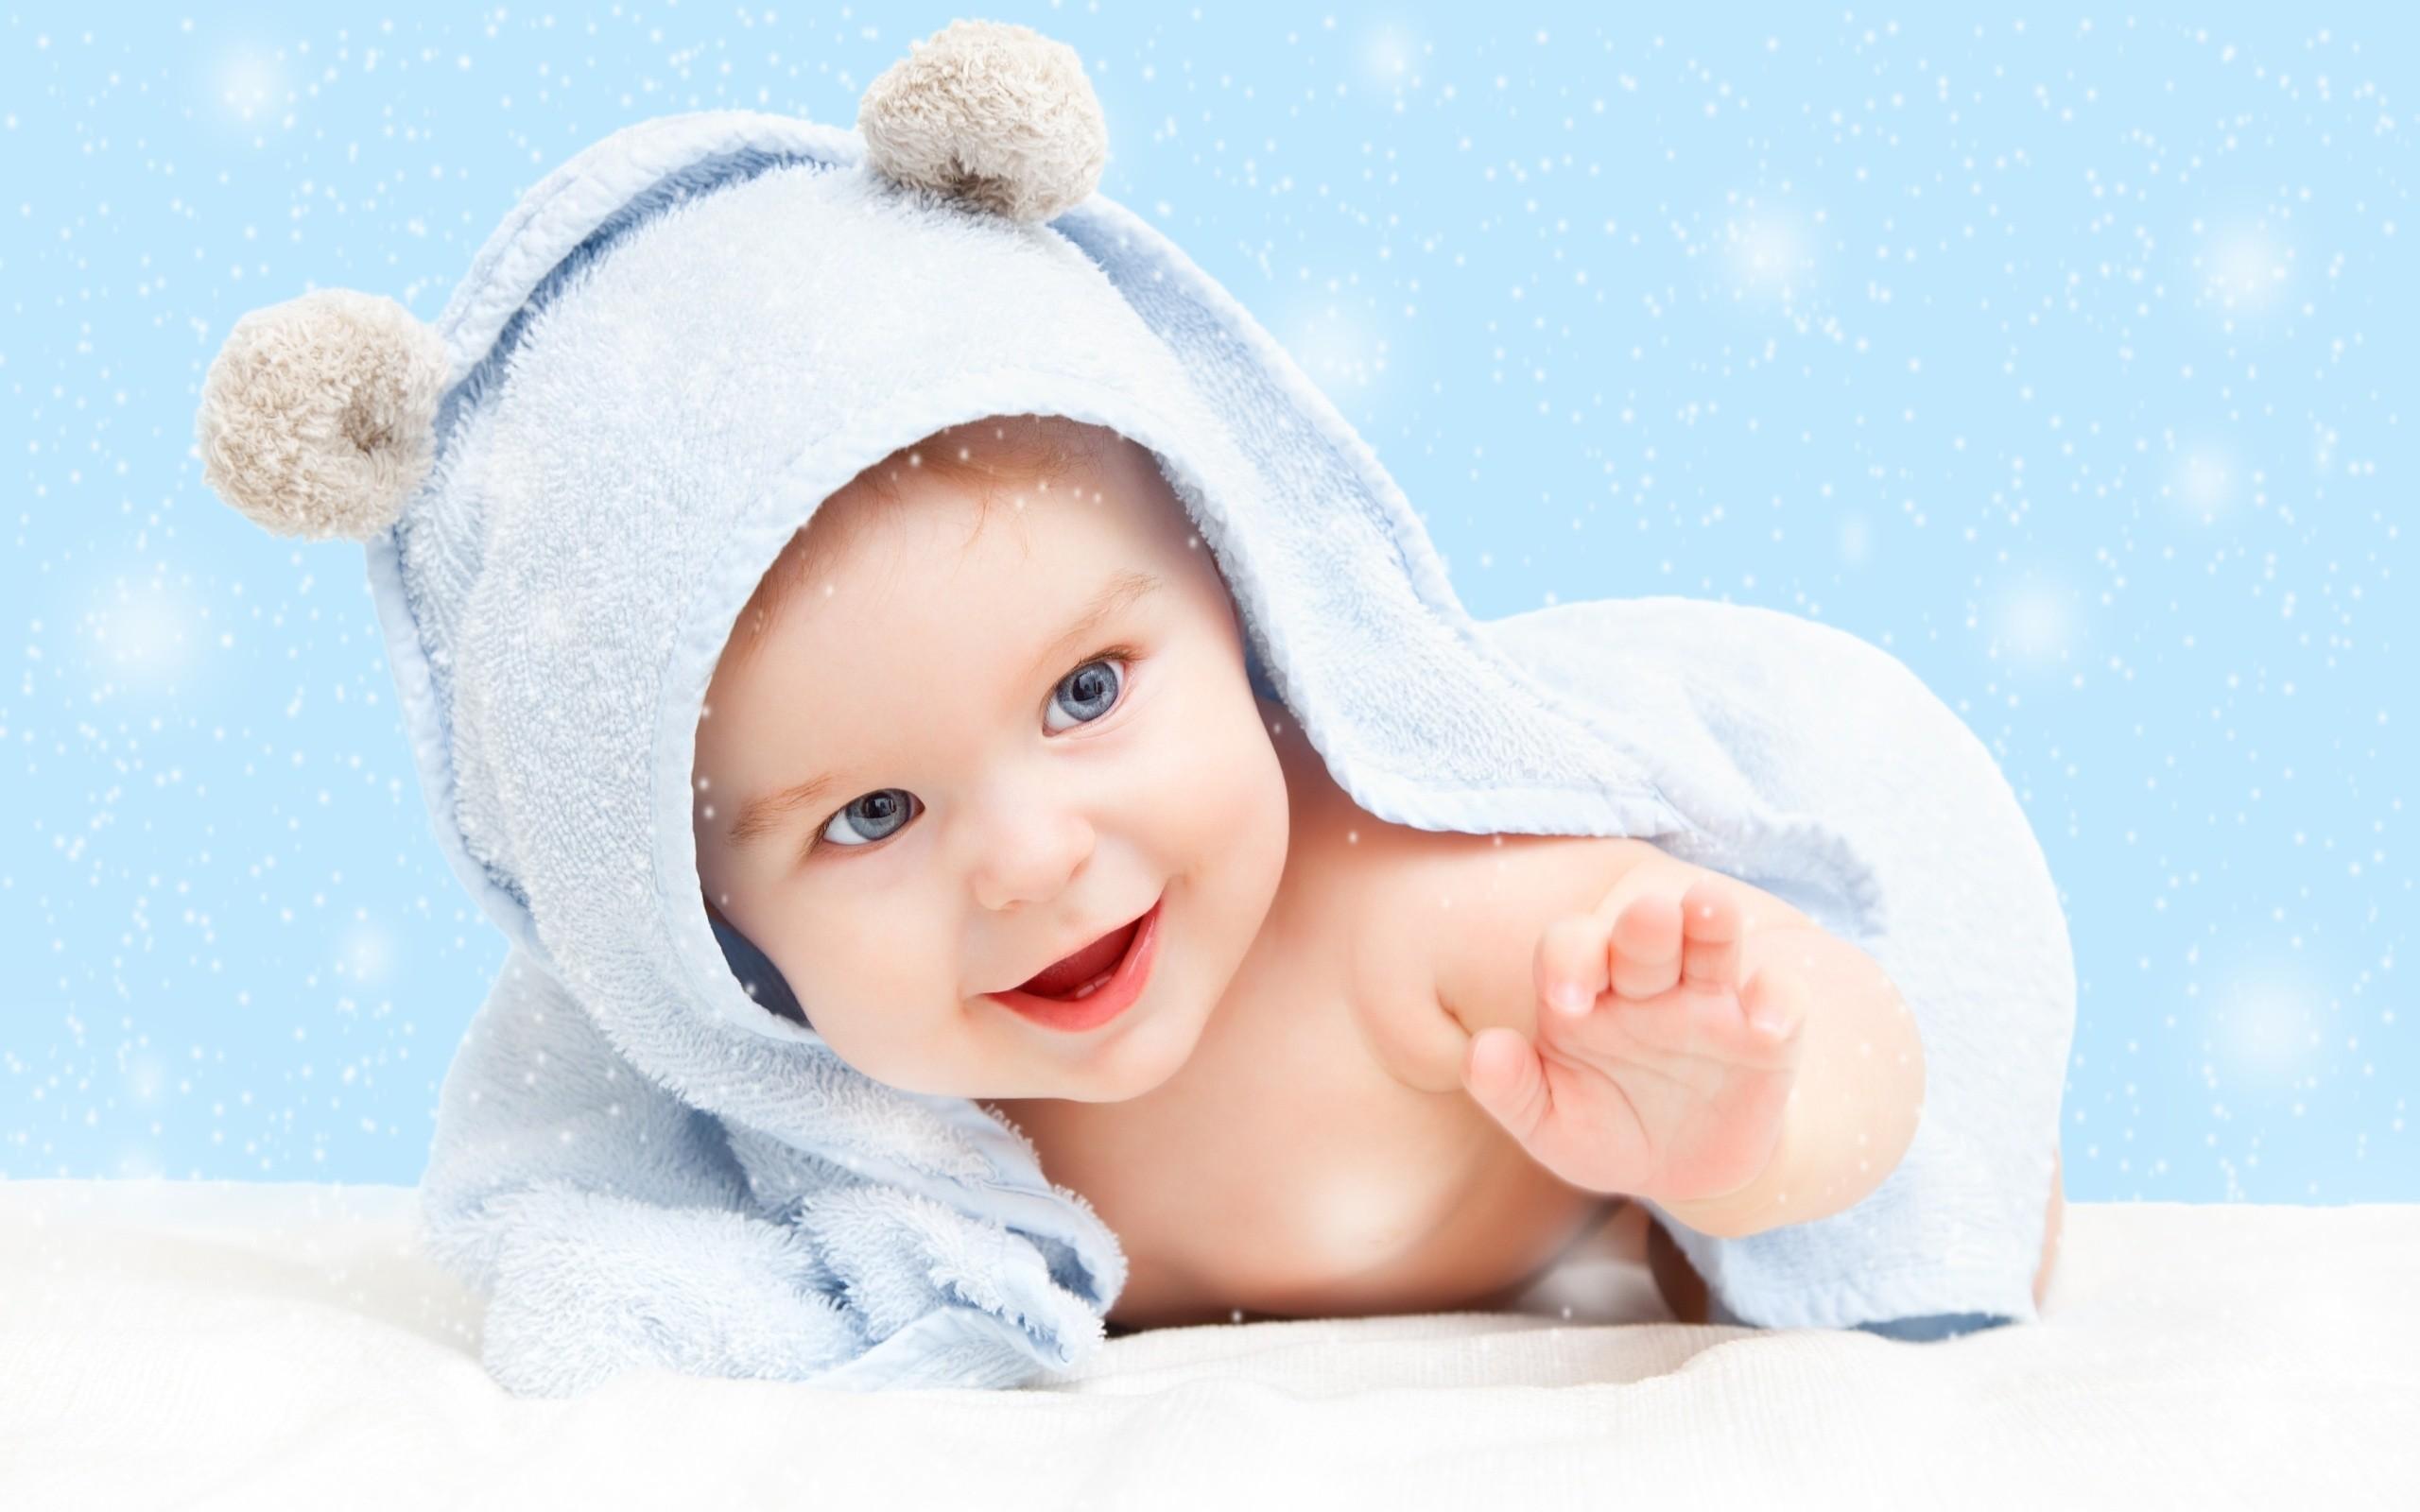 Cute Newborn Baby Wallpaper HD Wallpapers